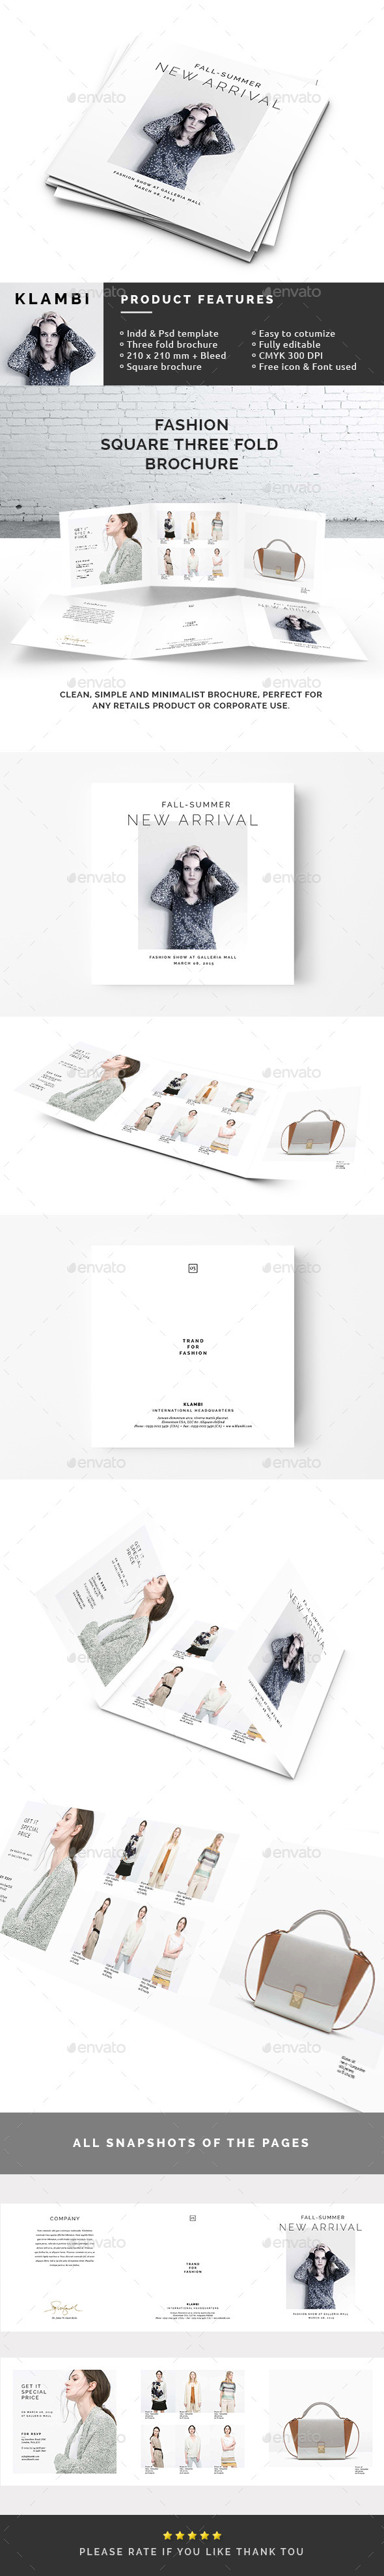 Square 3-Fold Fashion Brochure - Catalogs Brochures